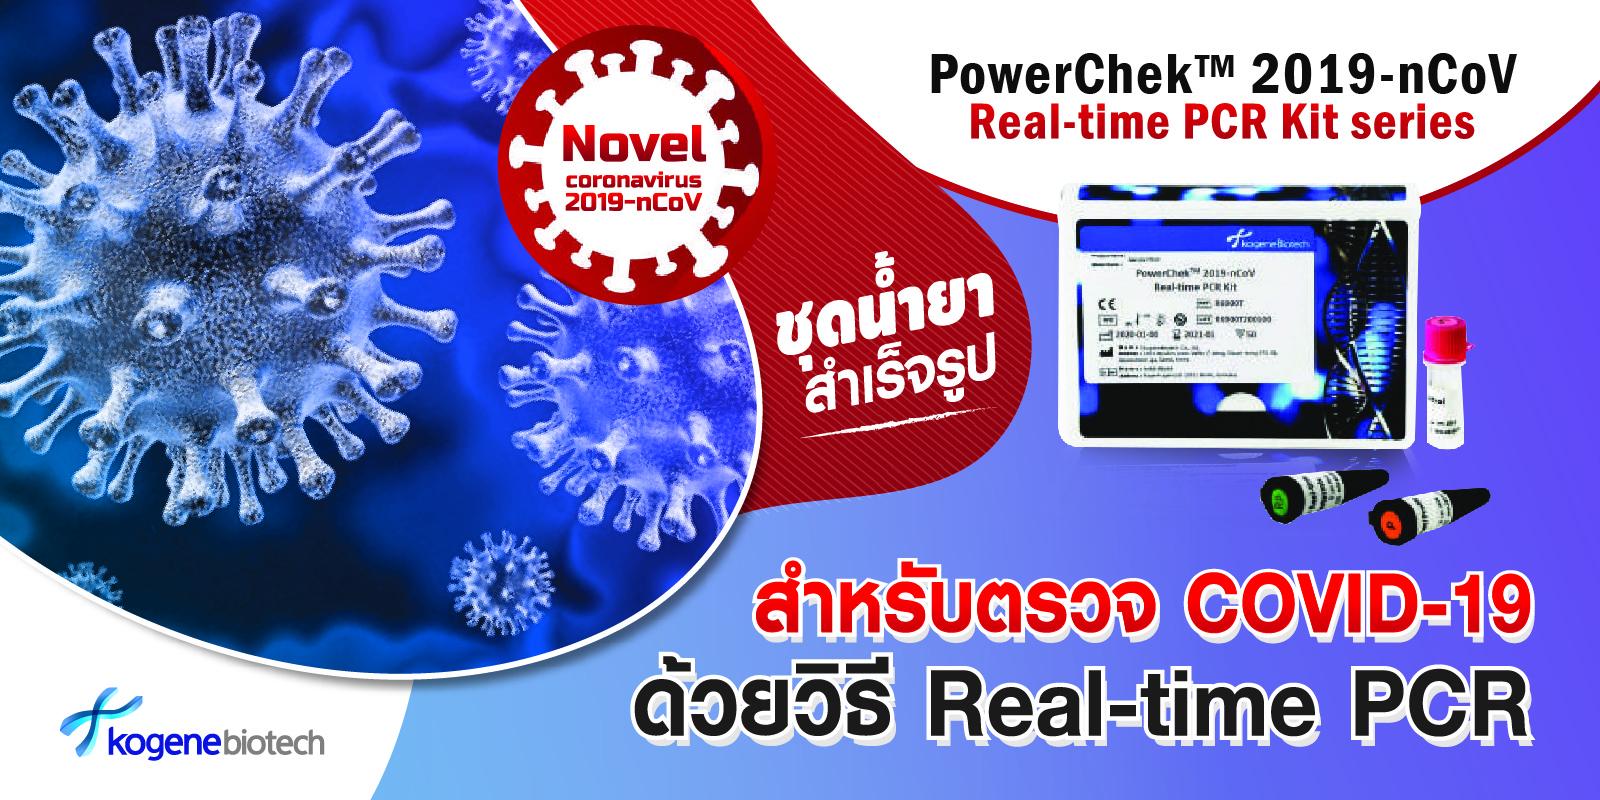 PowerChek 2019-nCoV Real-time PCR kit